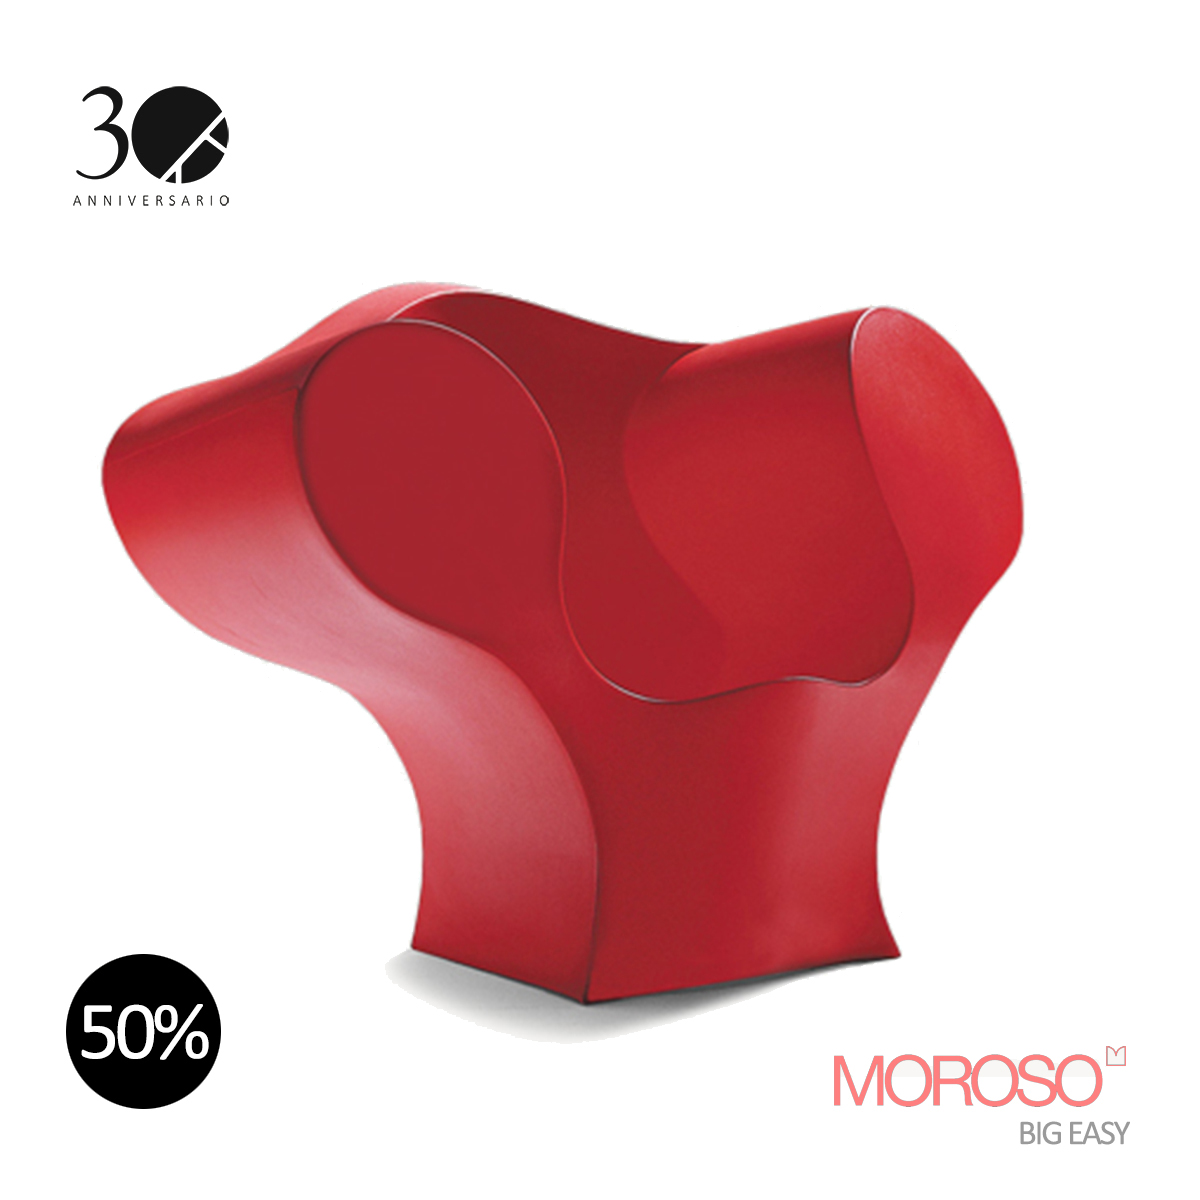 MOROSO - BIG EASY